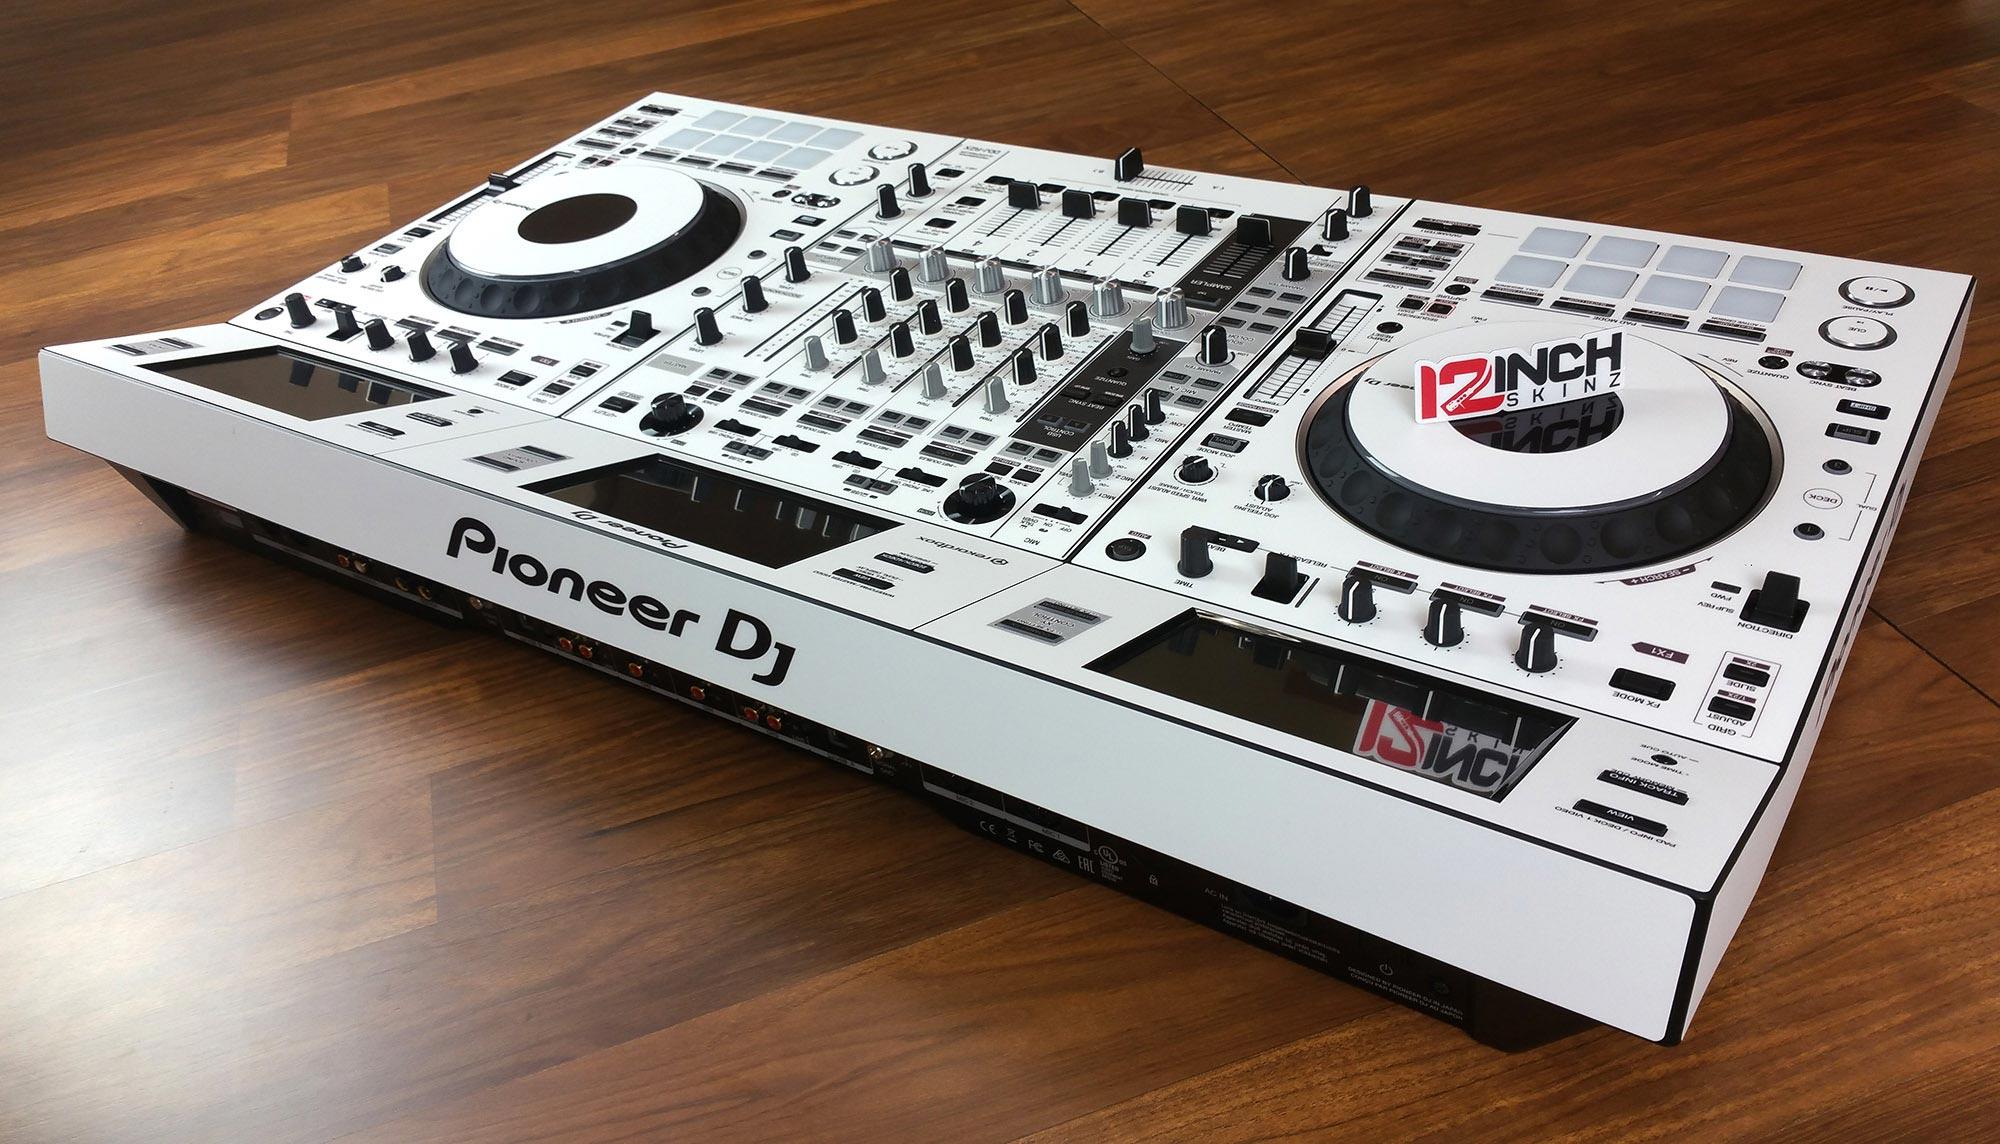 pioneer-ddj-rzx-white-skin-back